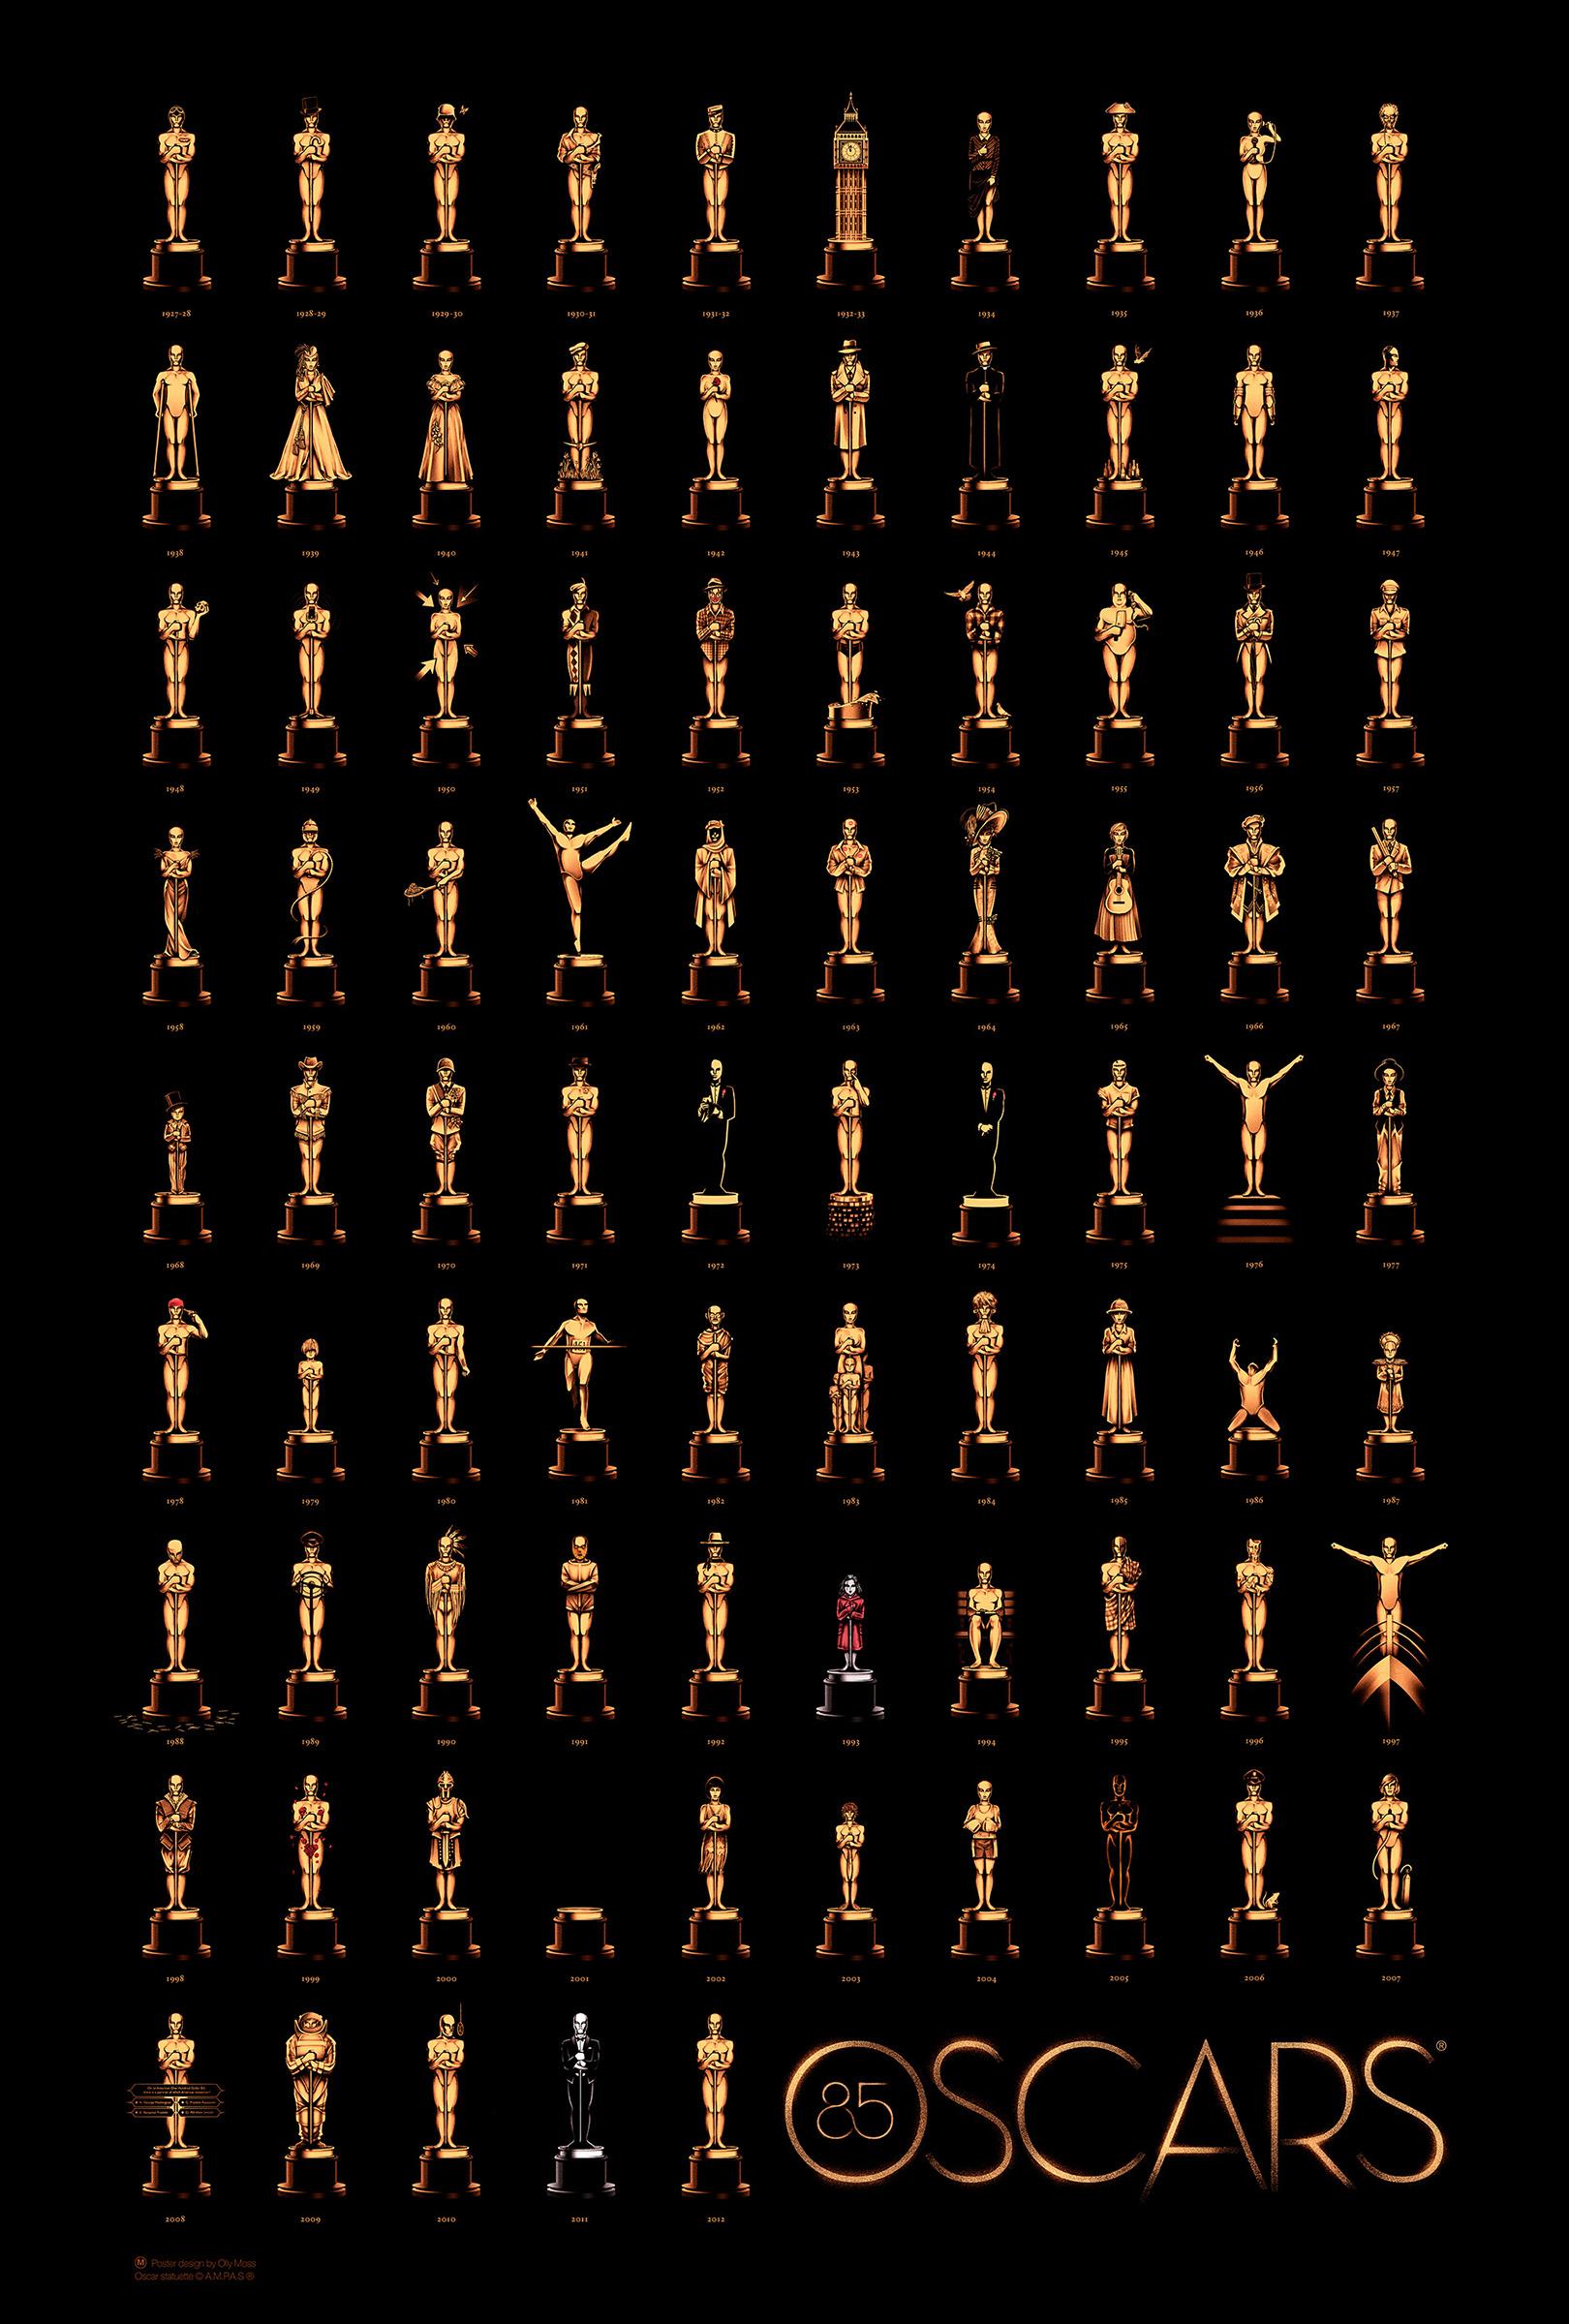 moss 85th Anniversary Oscars